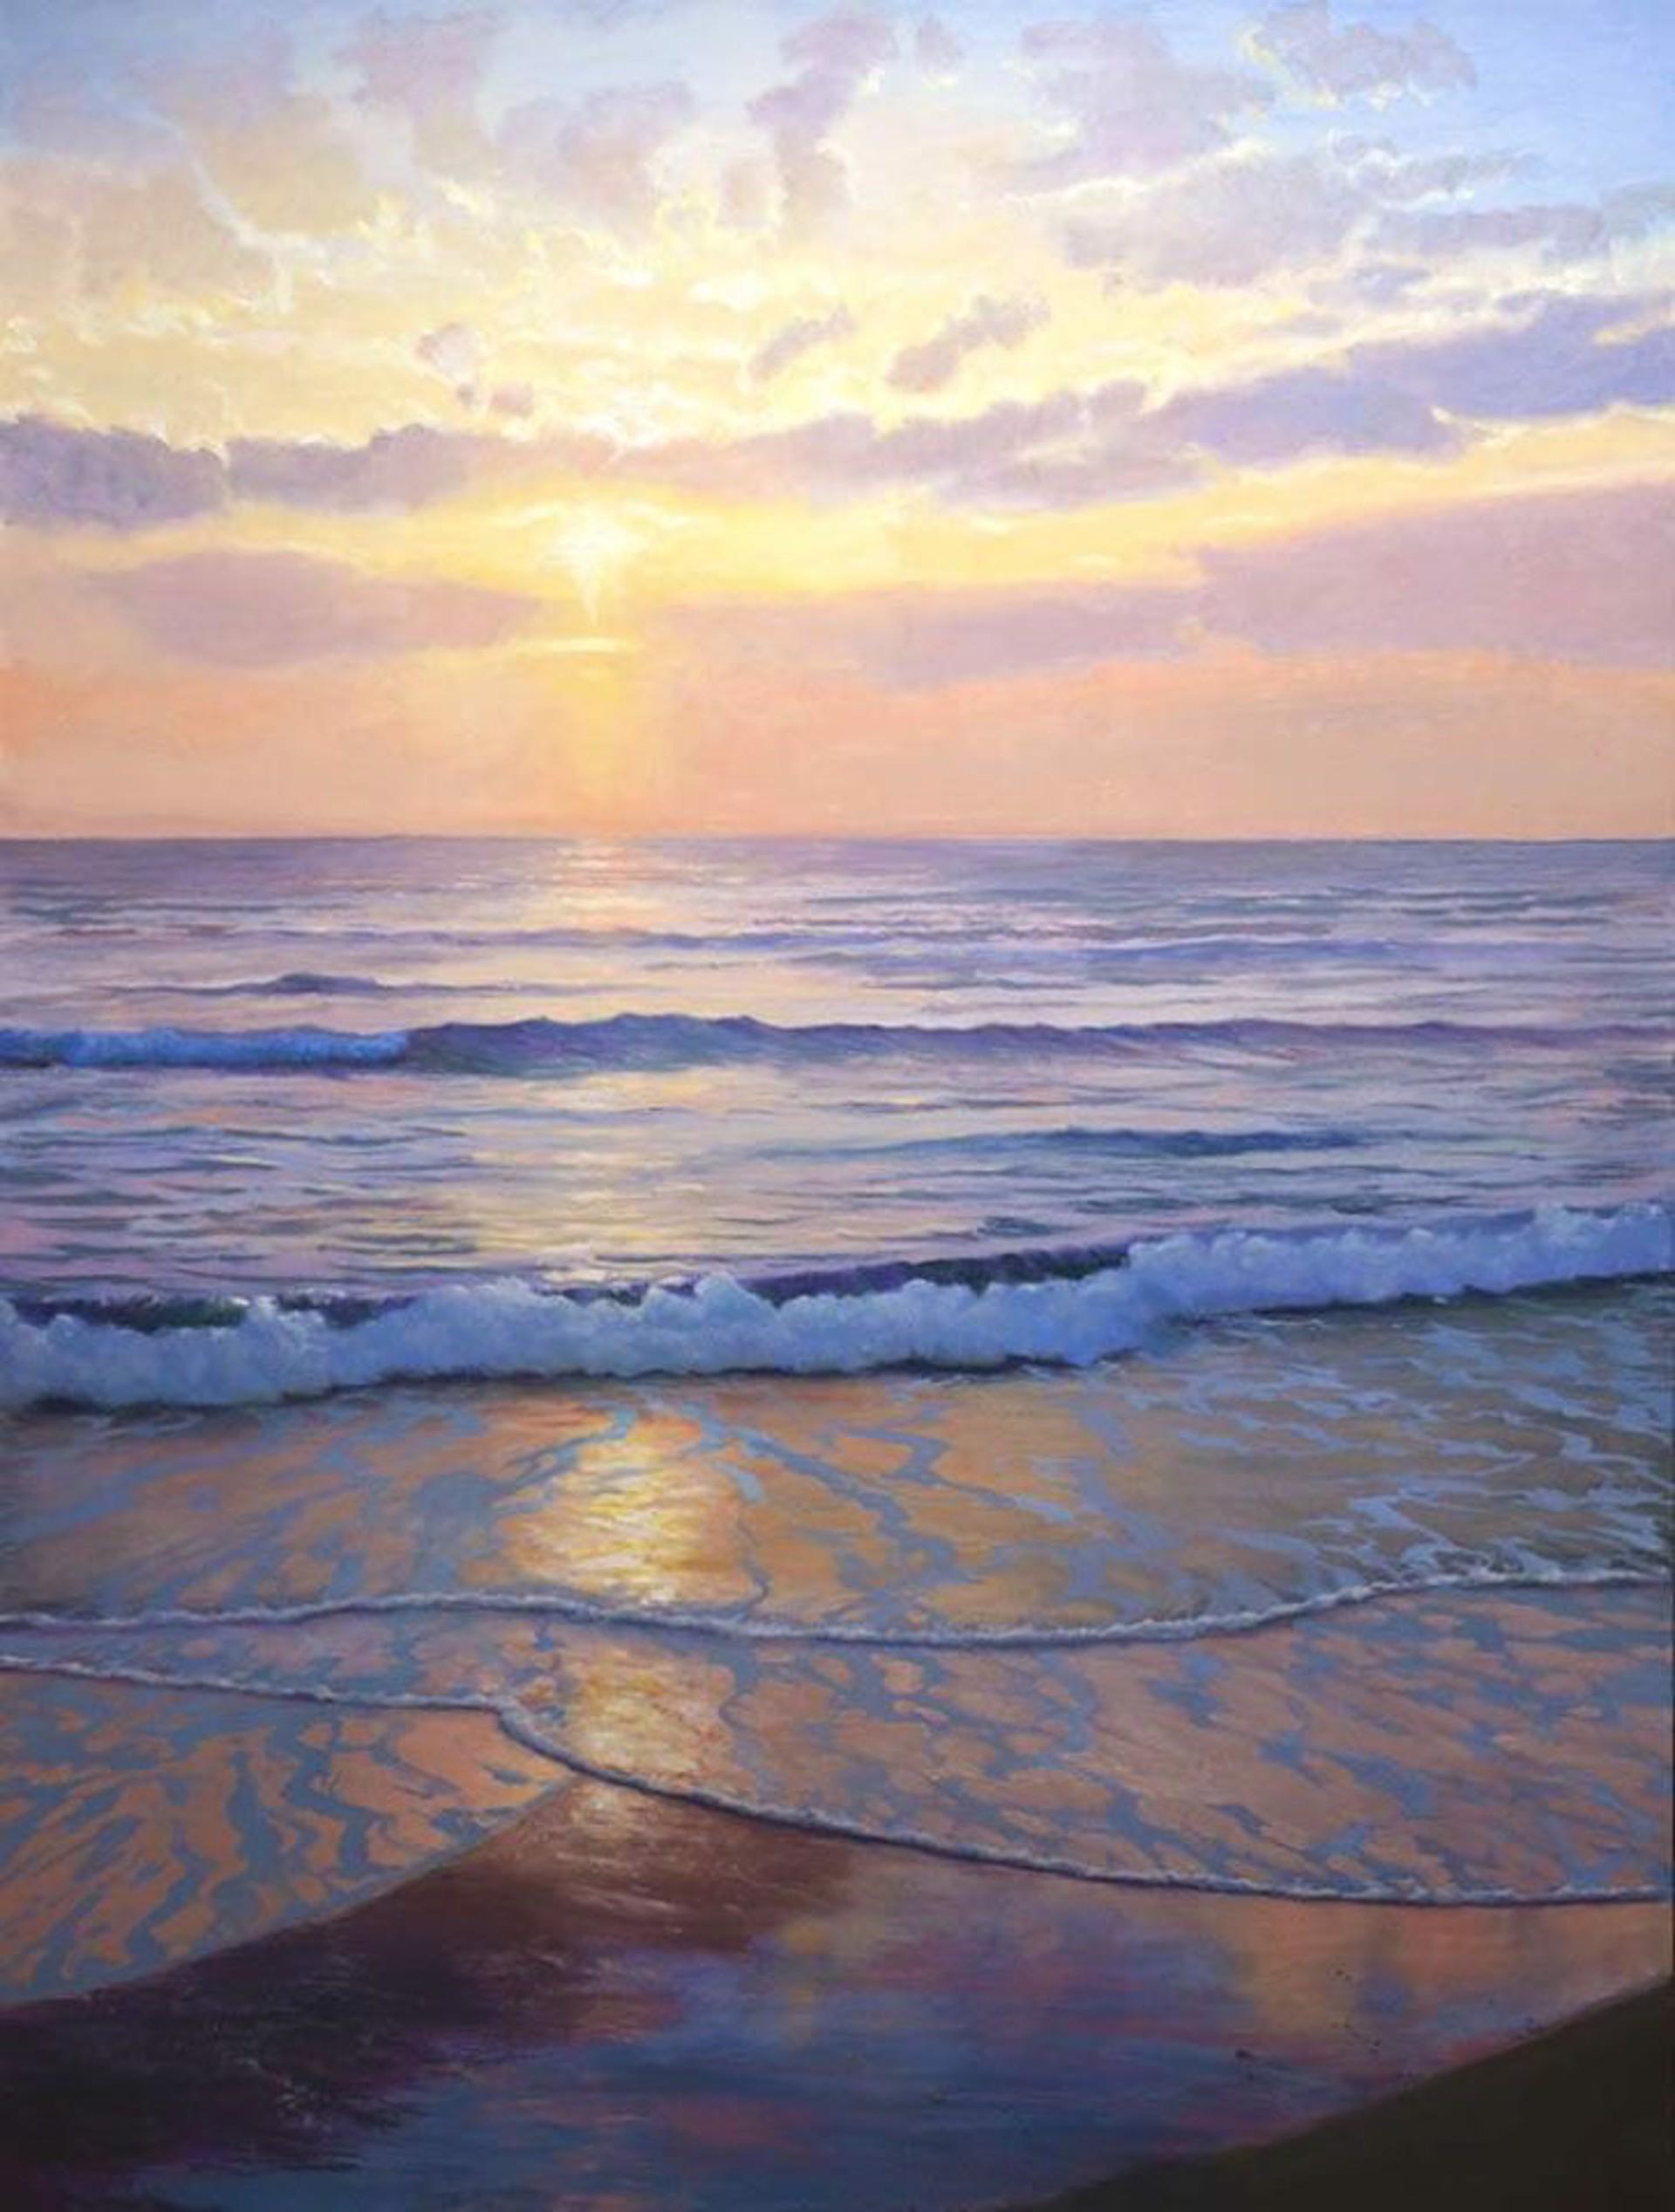 Resplendent Sunset by ARMAND CABRERA